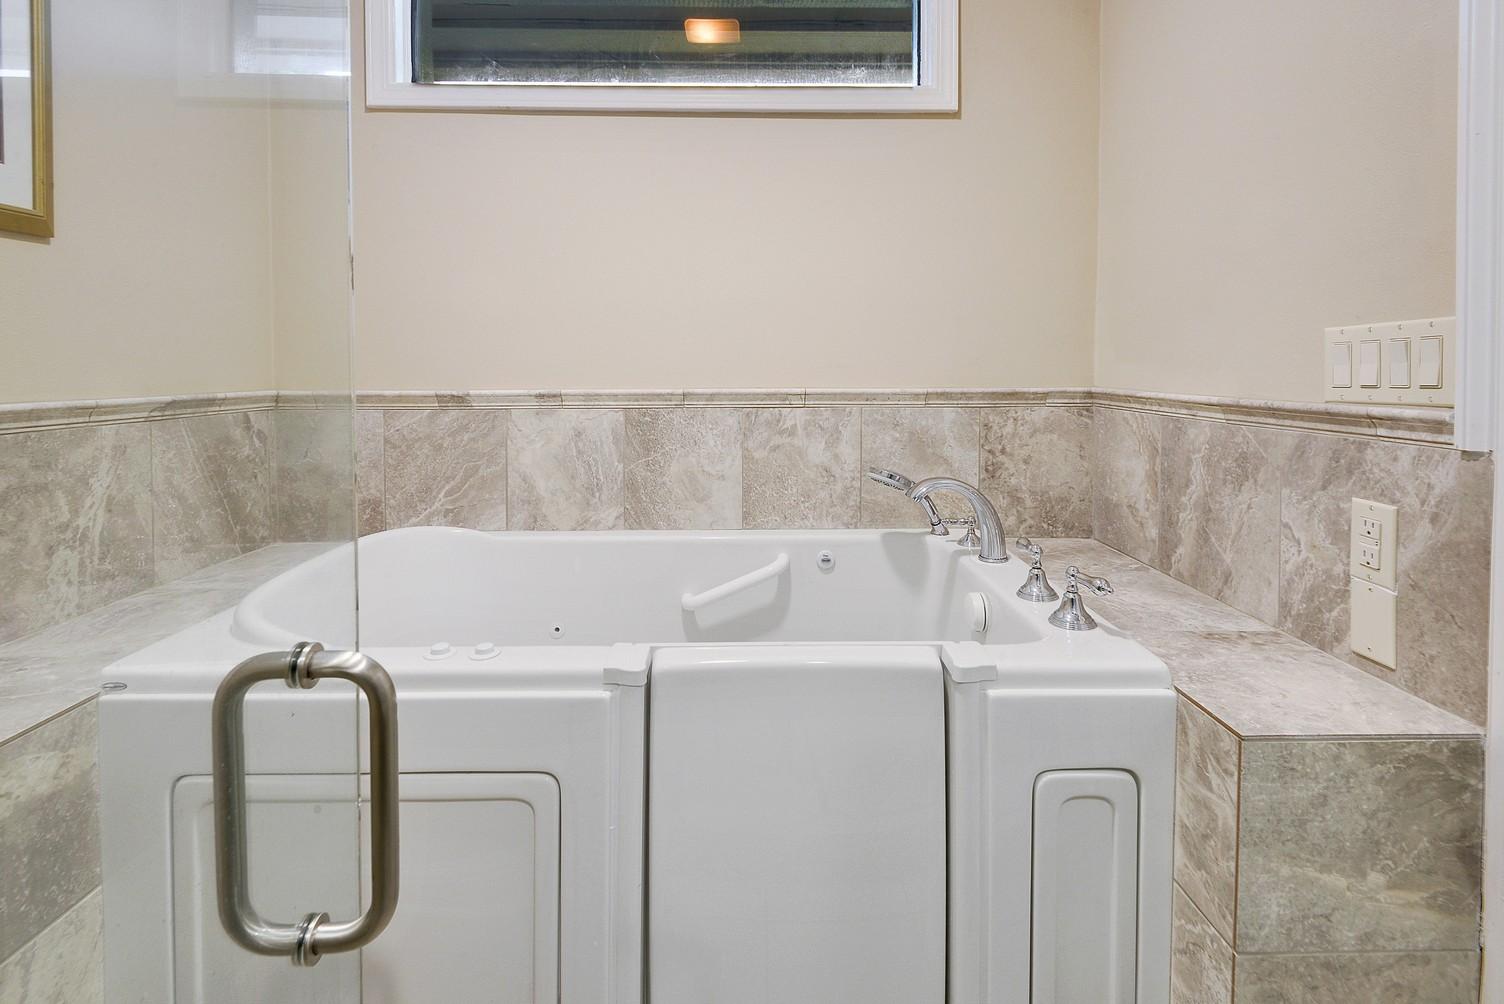 Walk In Tub Bathroom Remodeling in Baton Rouge  Zitro